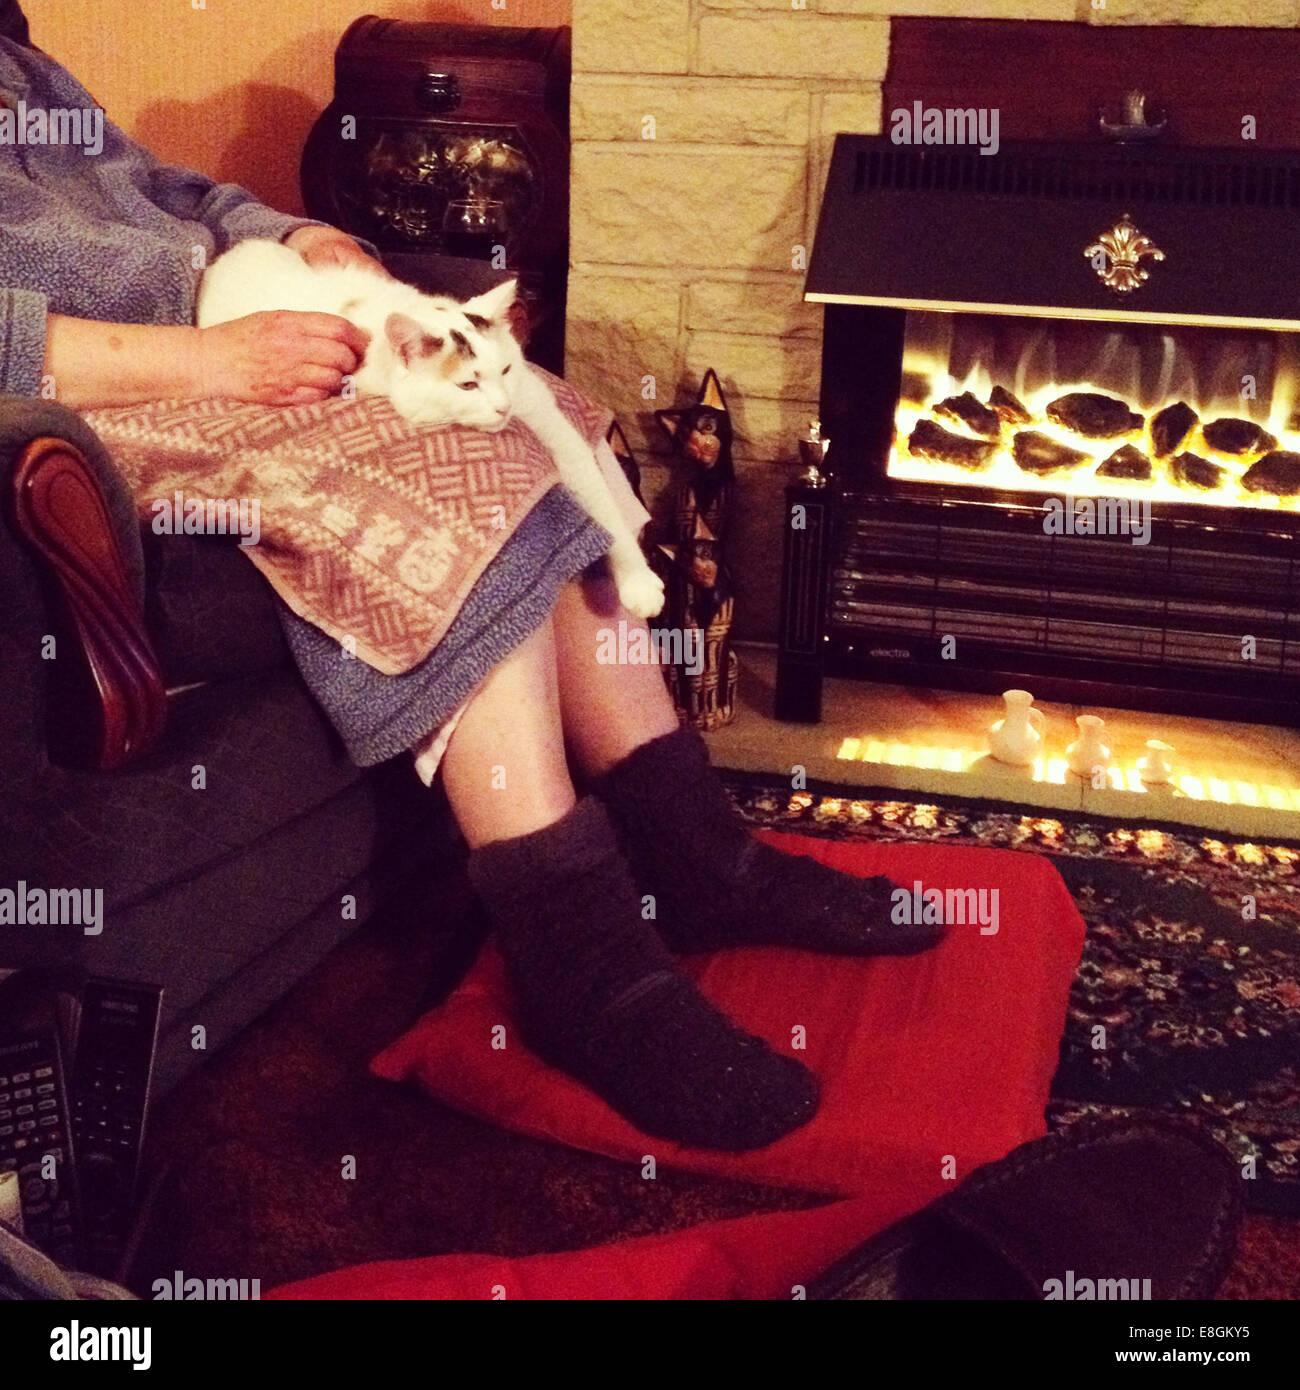 Cat lying on woman's lap - Stock Image